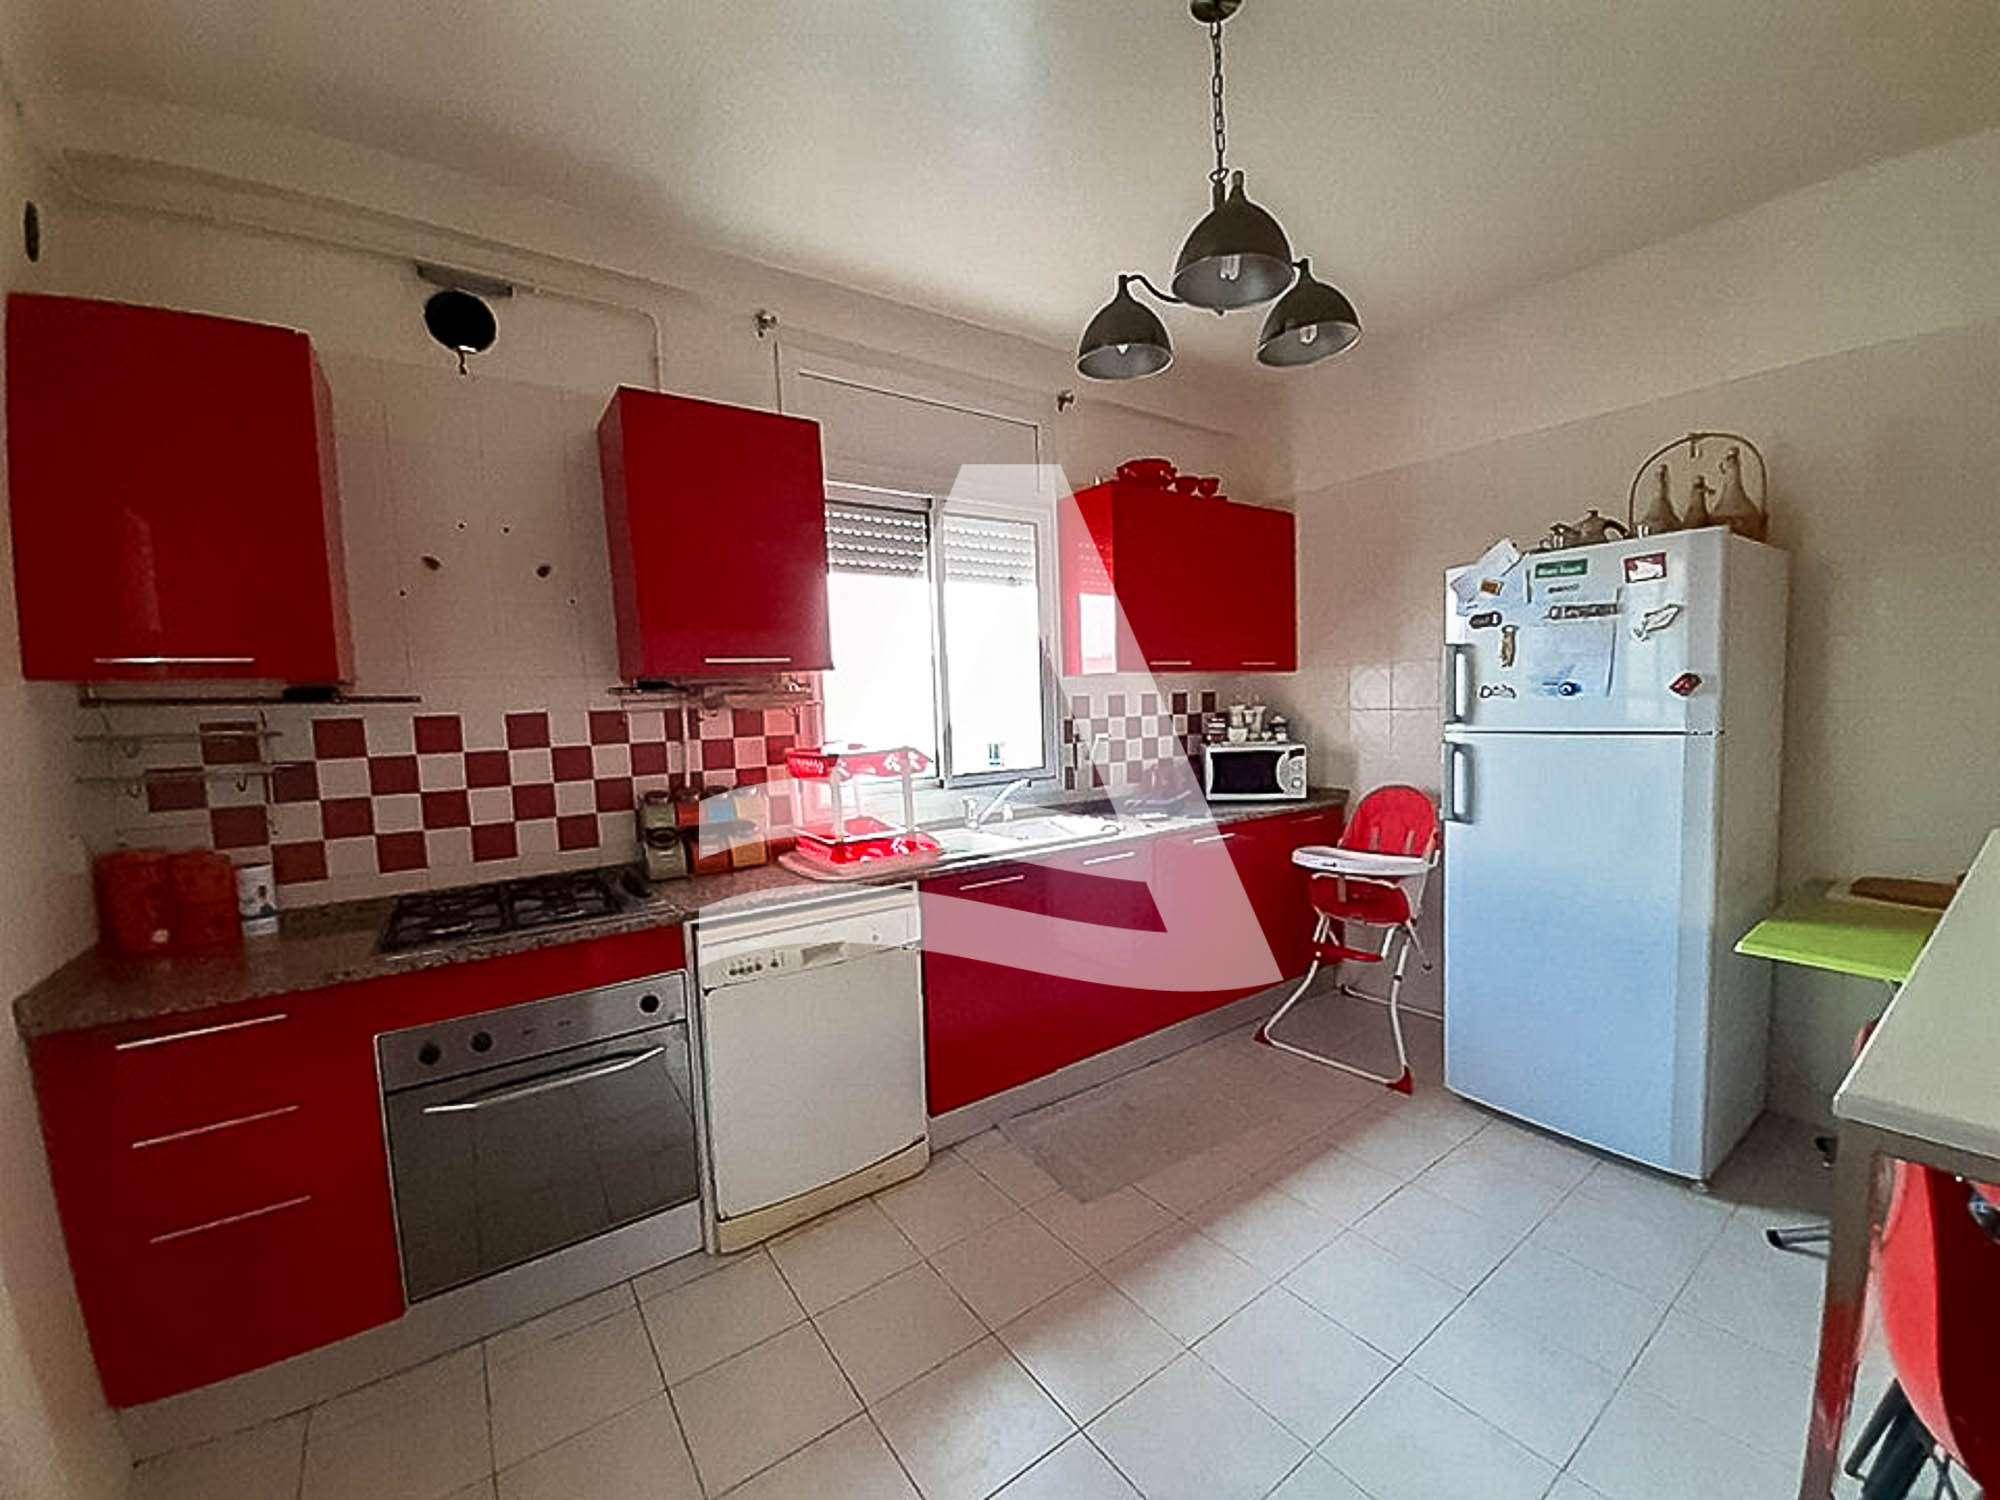 httpss3.amazonaws.comlogimoaws_Arcane_immobilière_la_Marsa-_location_-_vente_la_marsa_6_sur_16_1574071698417-1